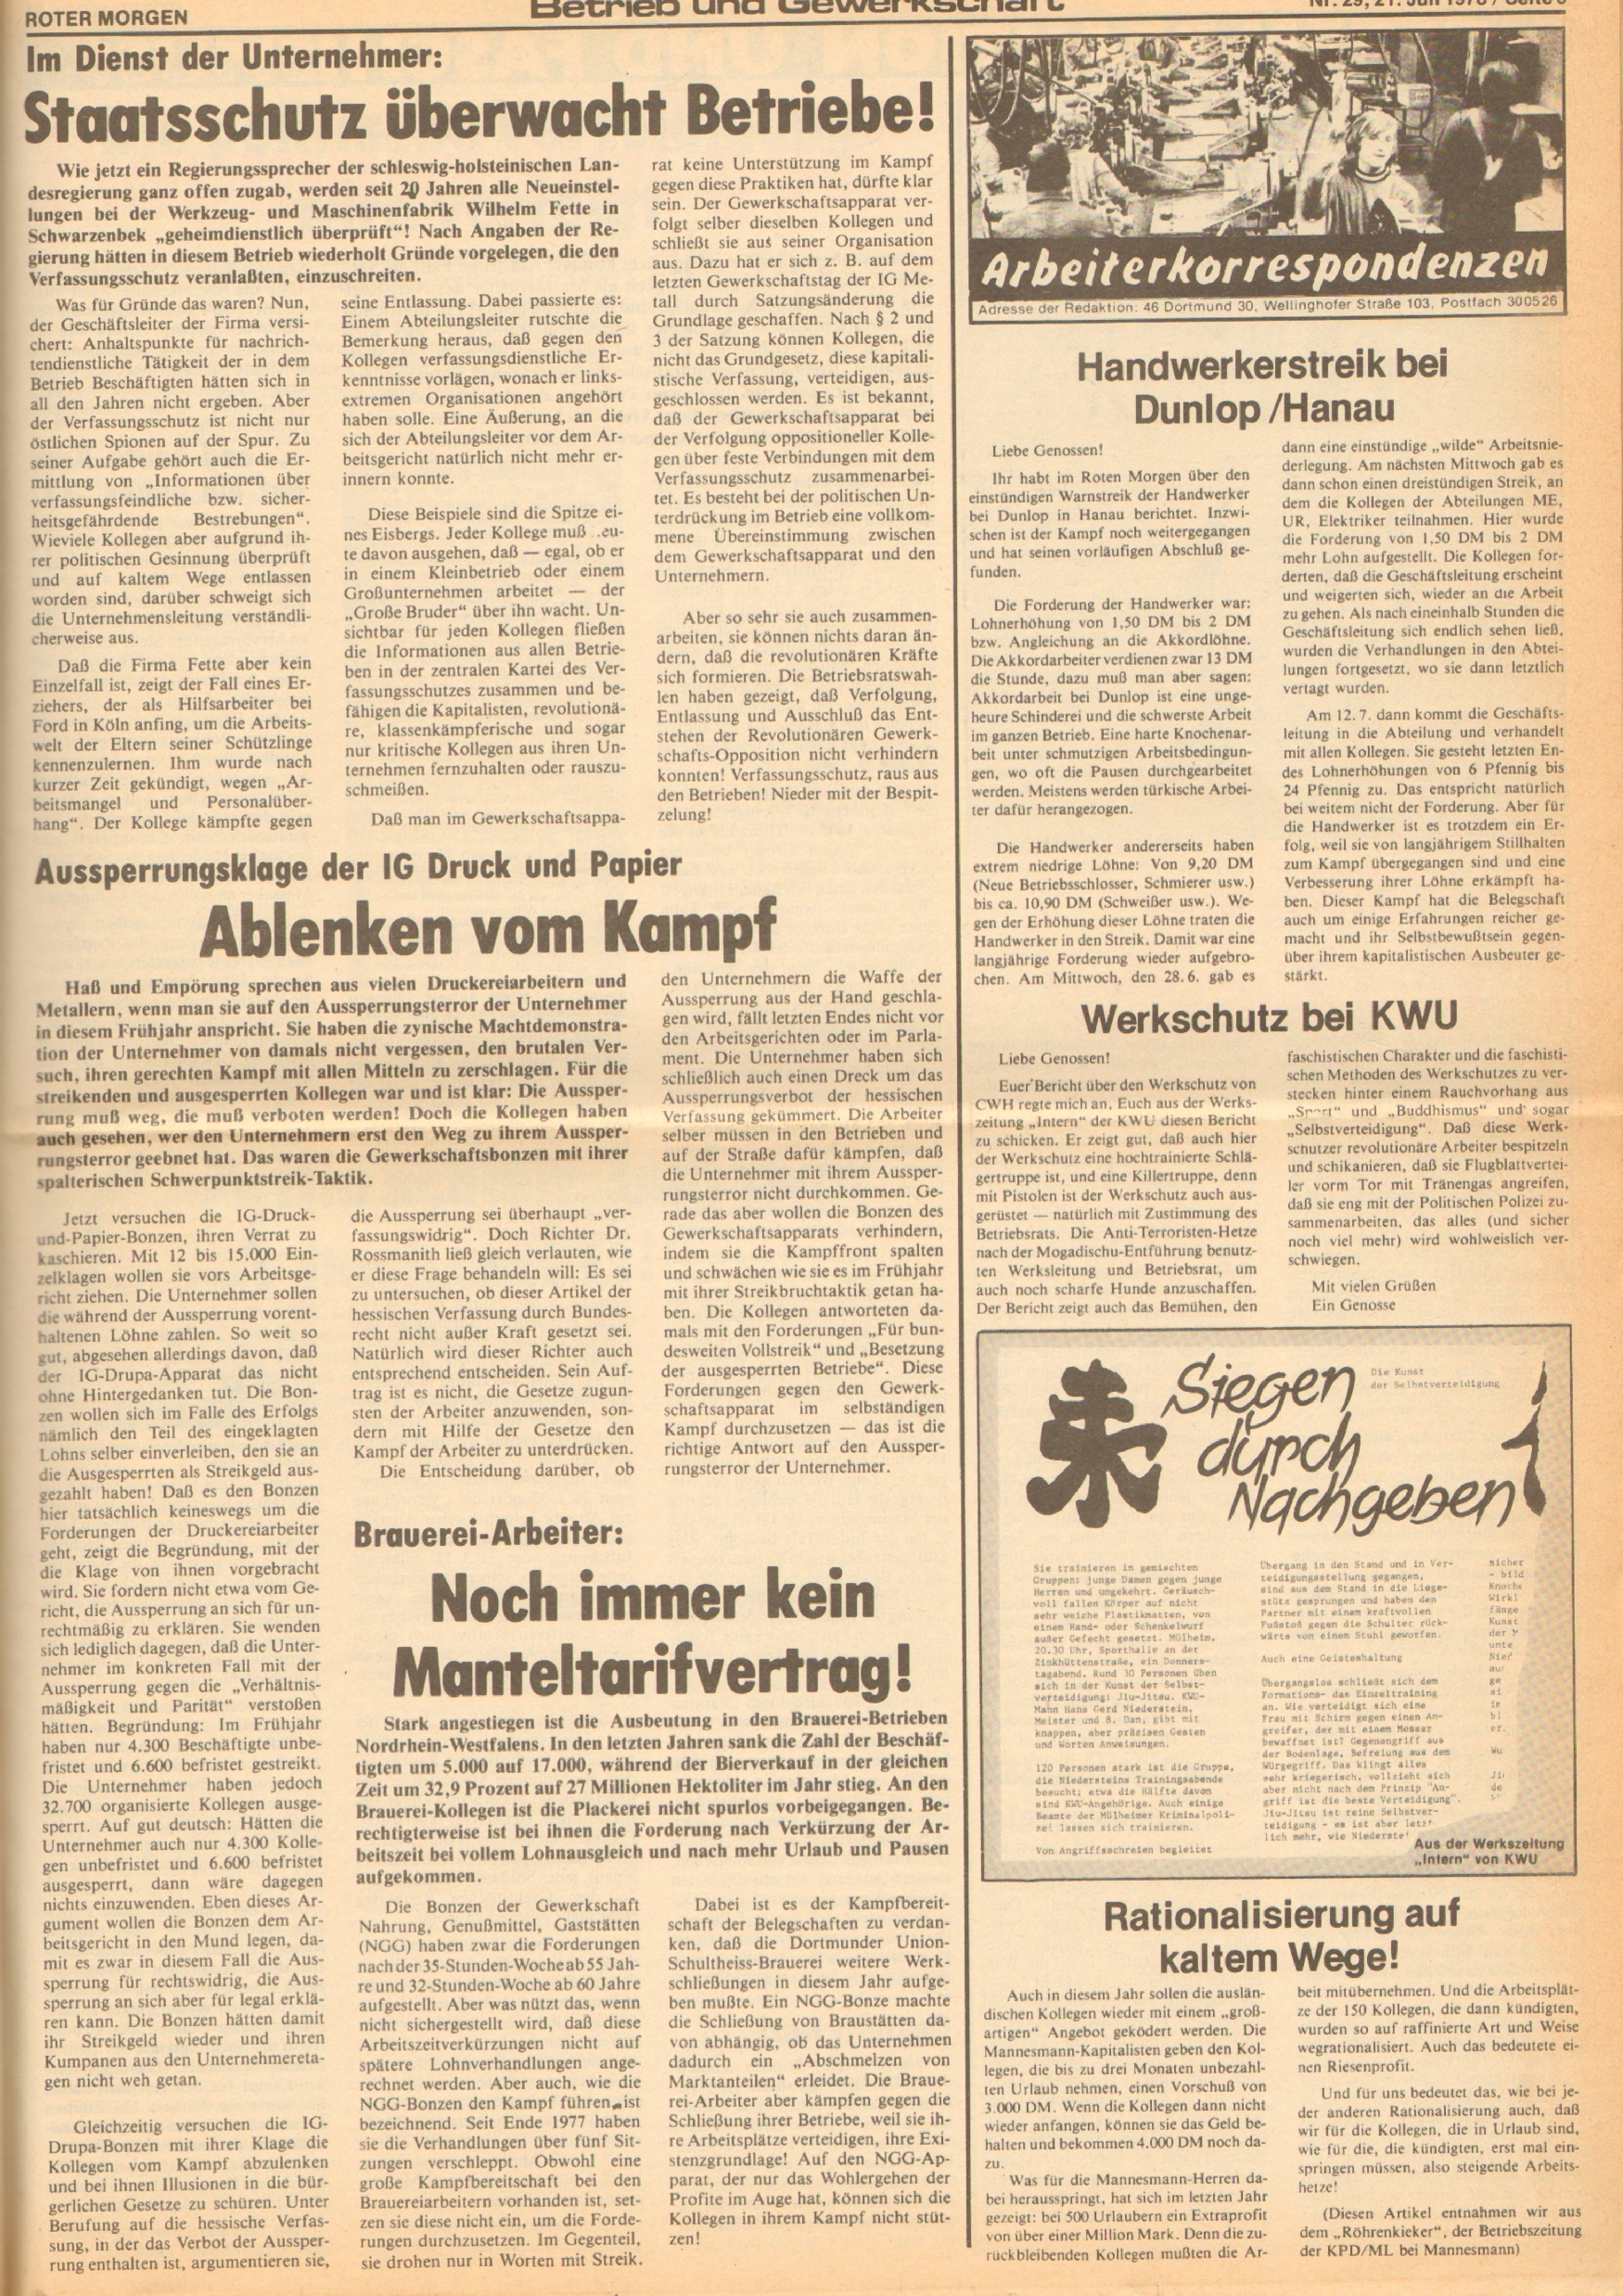 Roter Morgen, 12. Jg., 21. Juli 1978, Nr. 29, Seite 5